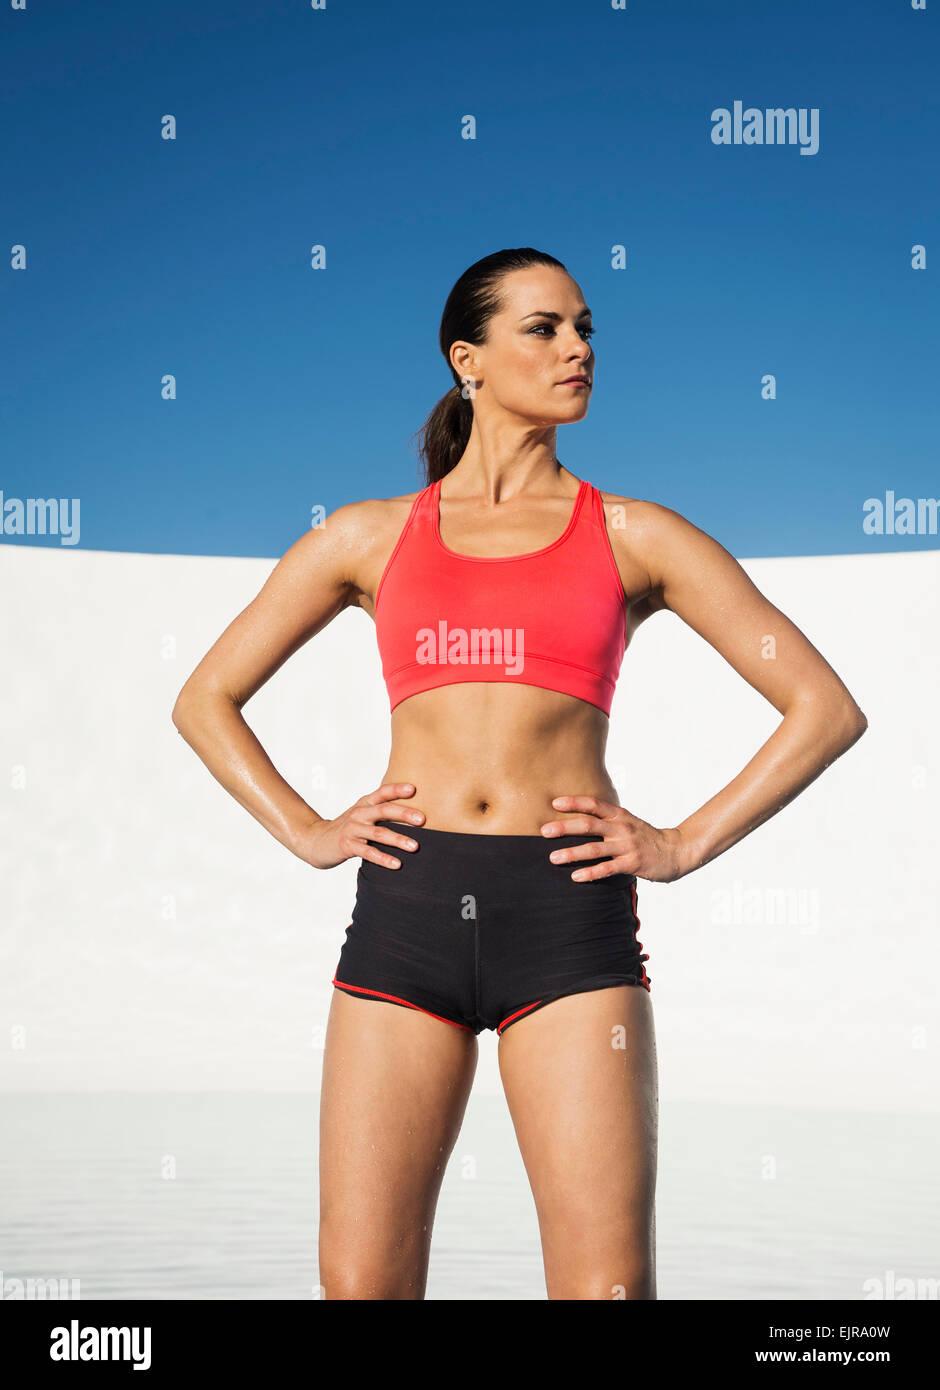 L'athlète de race blanche standing with hands on hips Banque D'Images